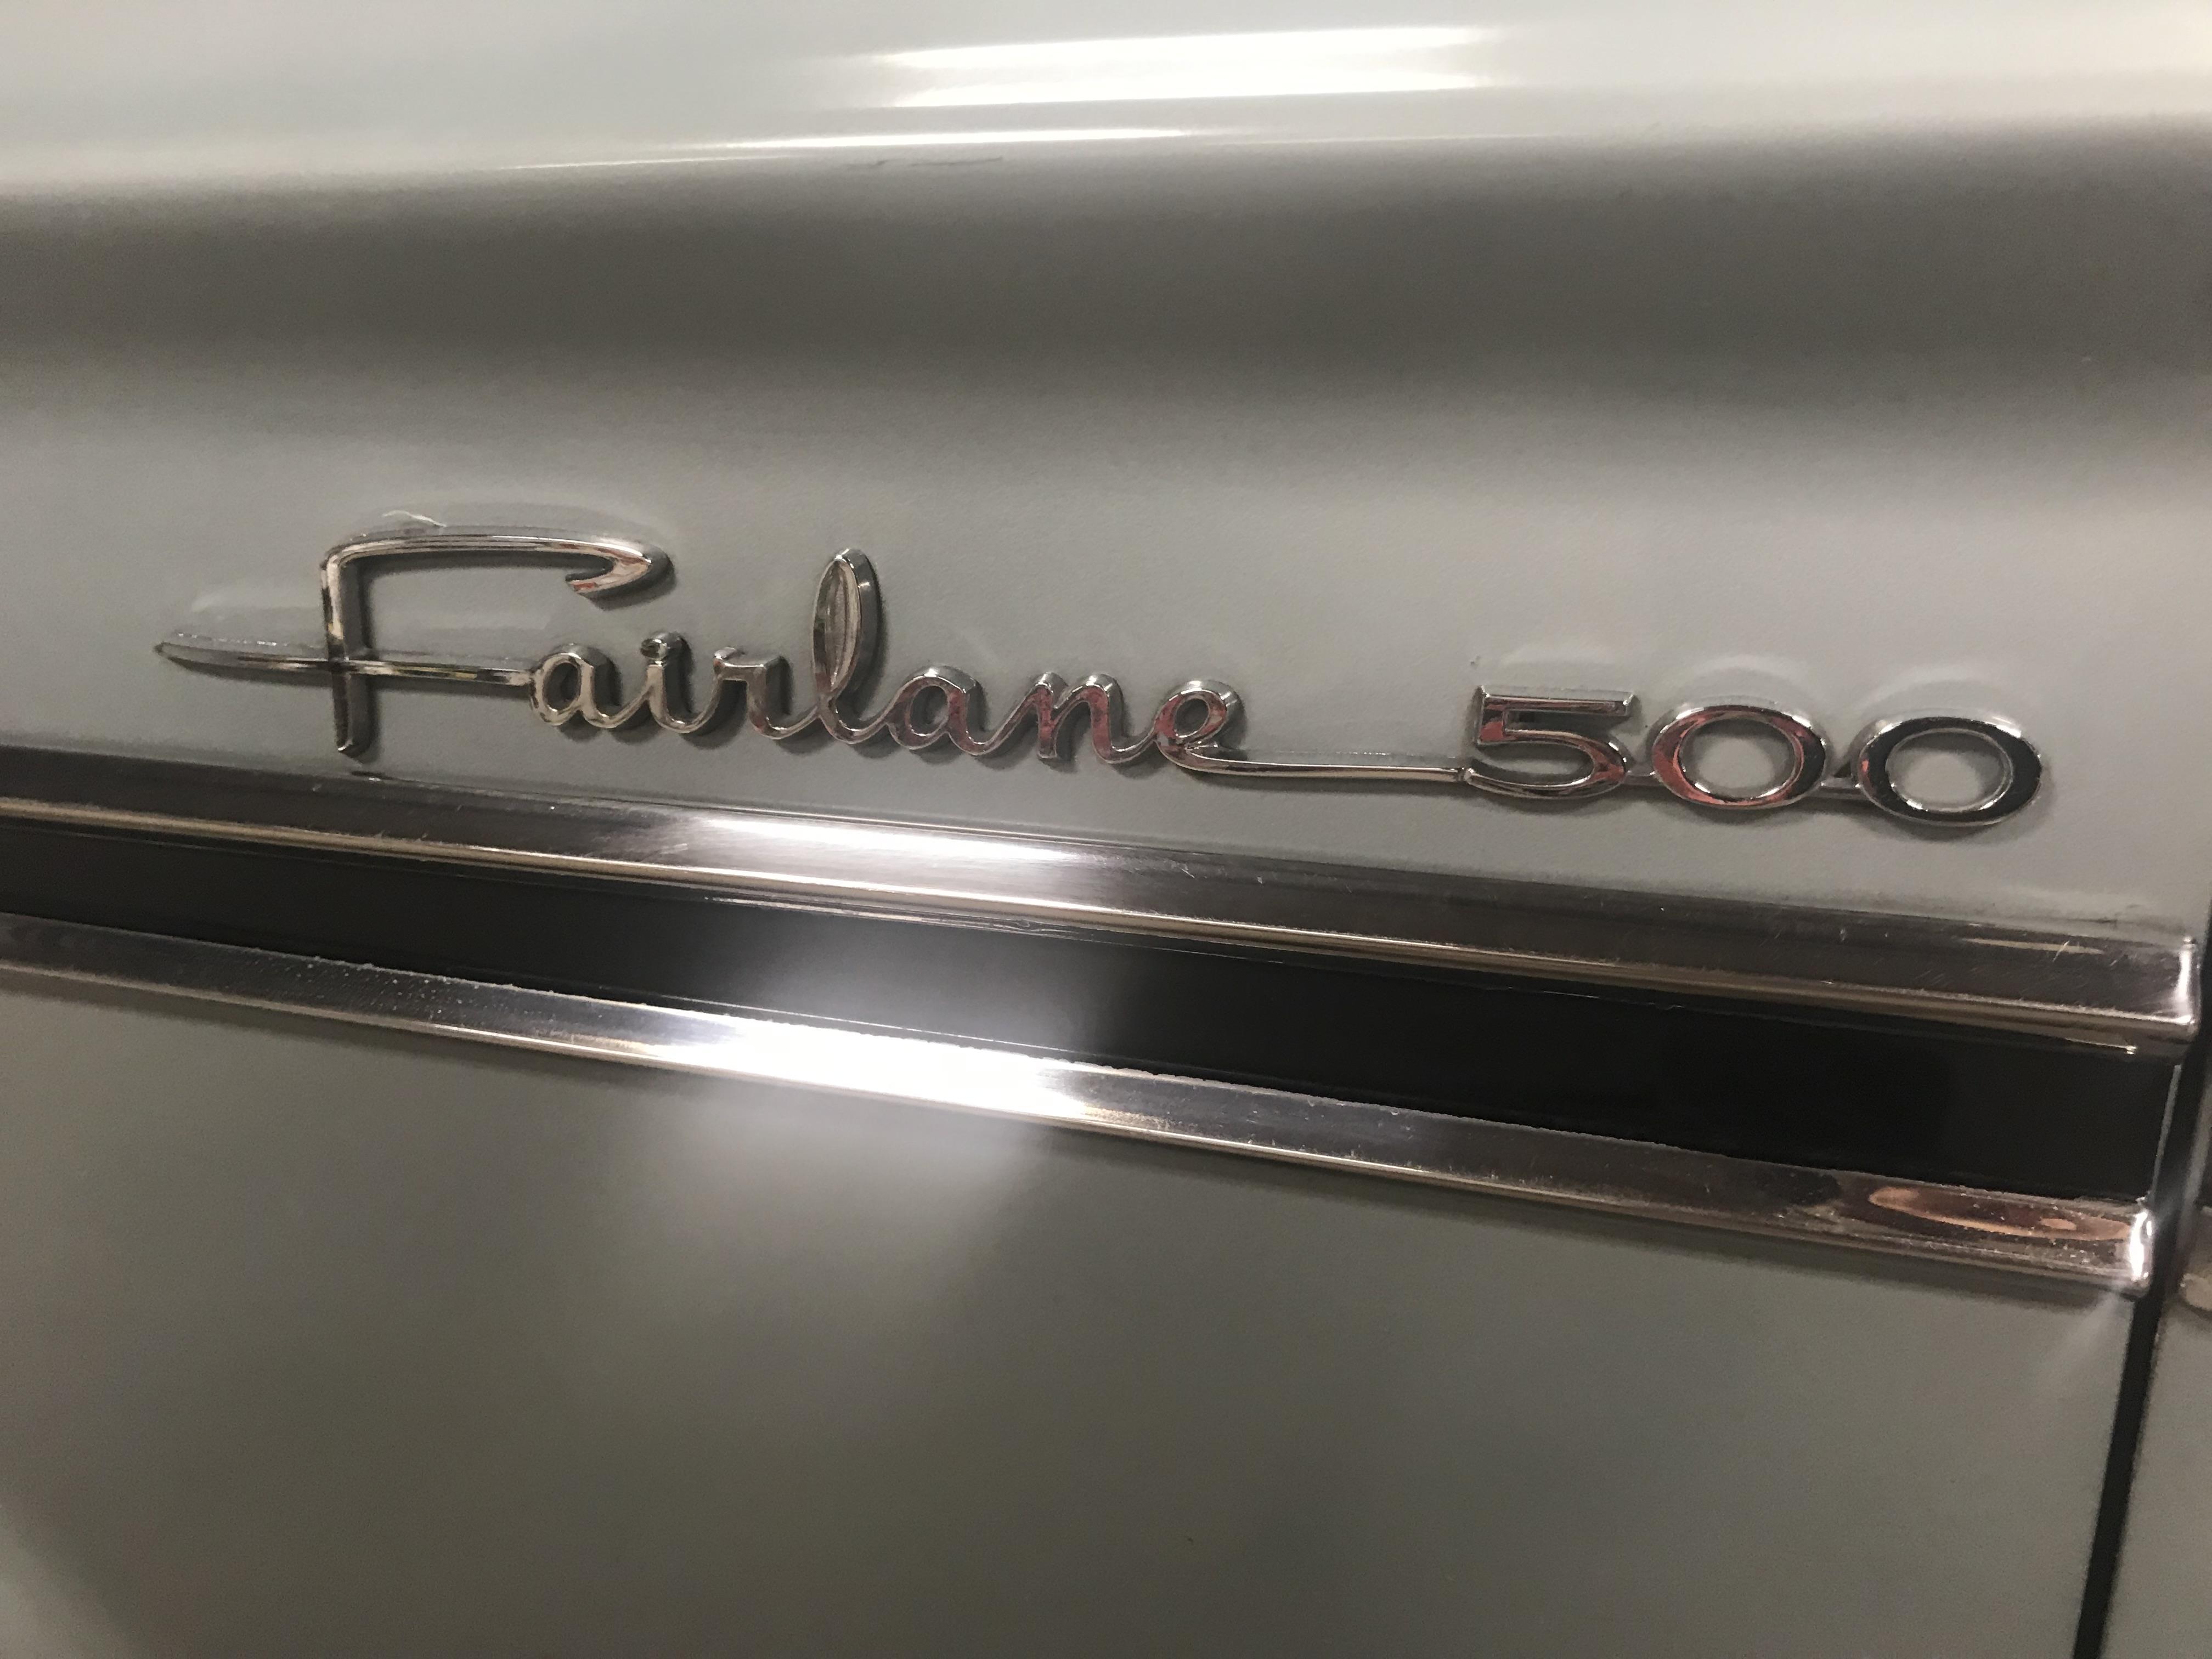 Lot 2 - 1964 Ford Fairlane 500 2dr Sedan, 260 V-8, Auto, PS, 75,808 original miles!